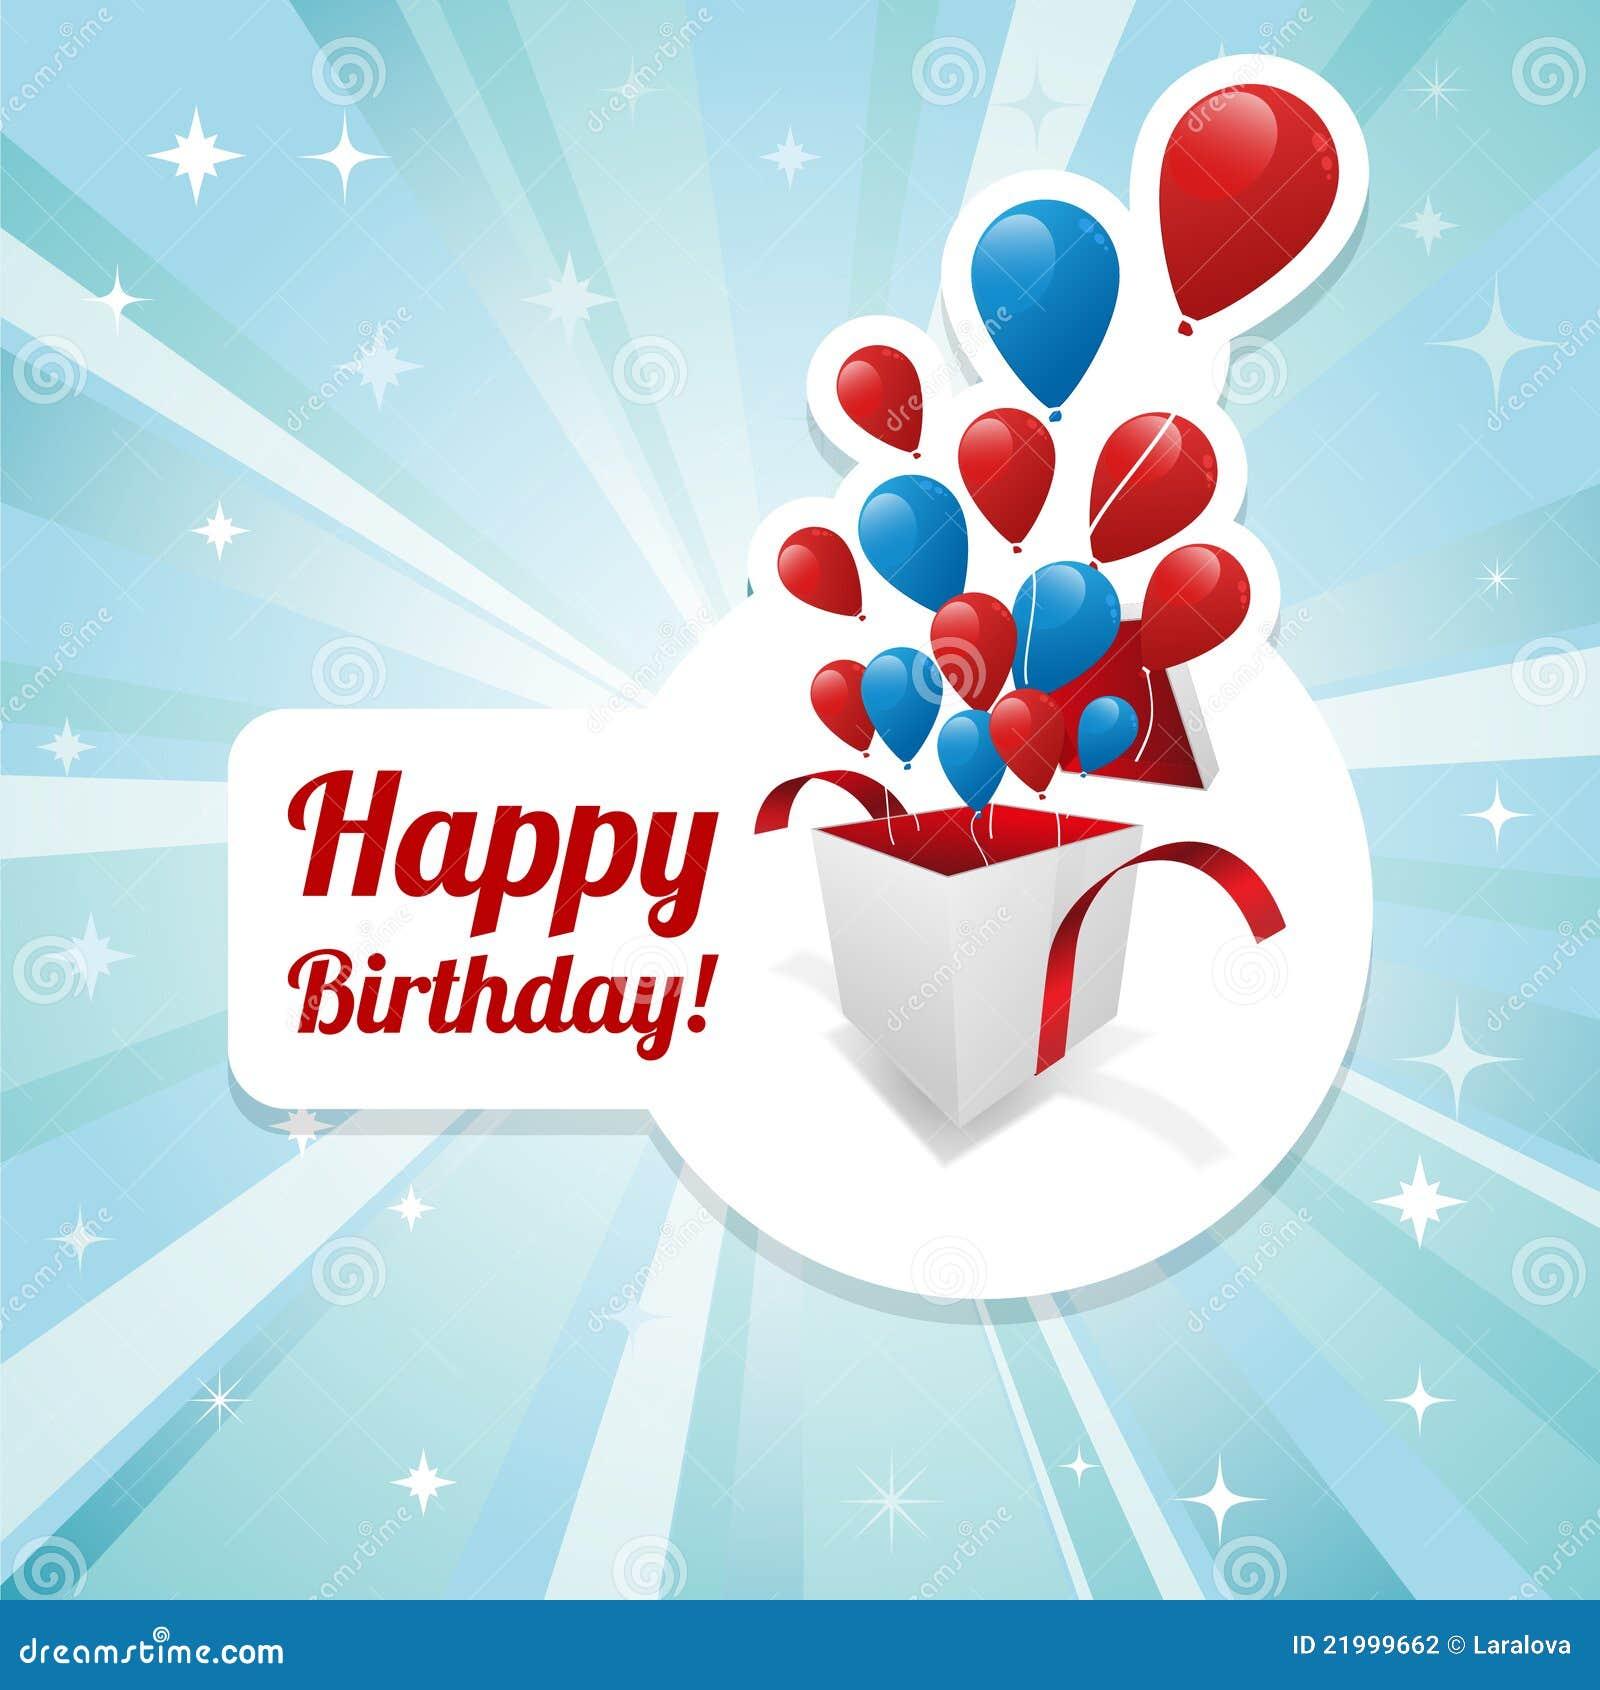 happy birthday card for - photo #47